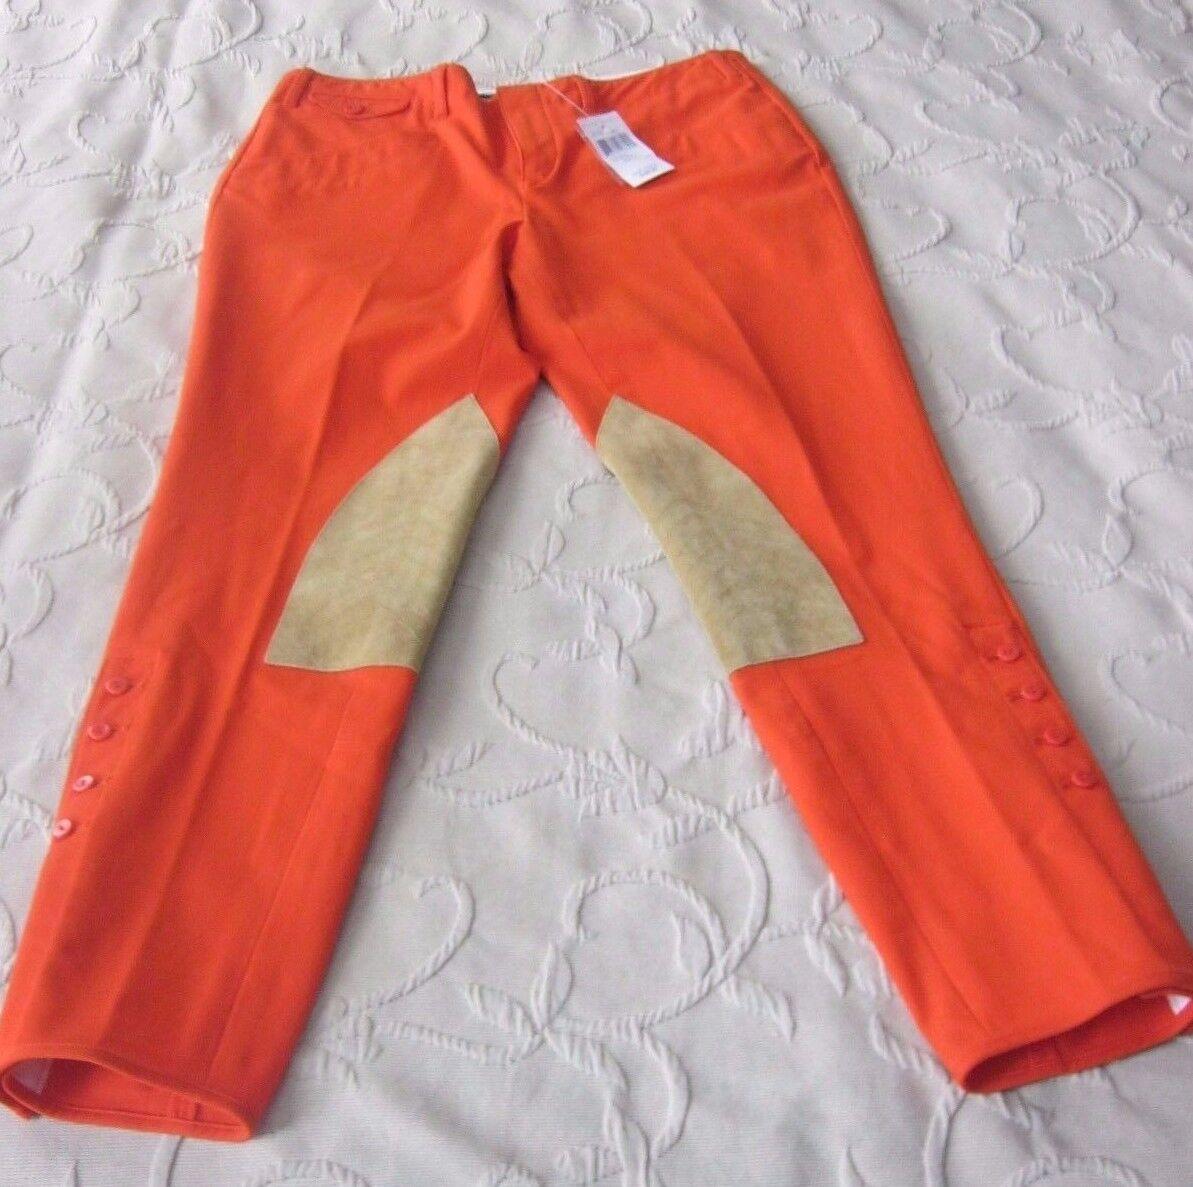 NWT Polo Ralph Lauren Sport Jodhpurs Breeches Equestrian Riding Pants Womens 6